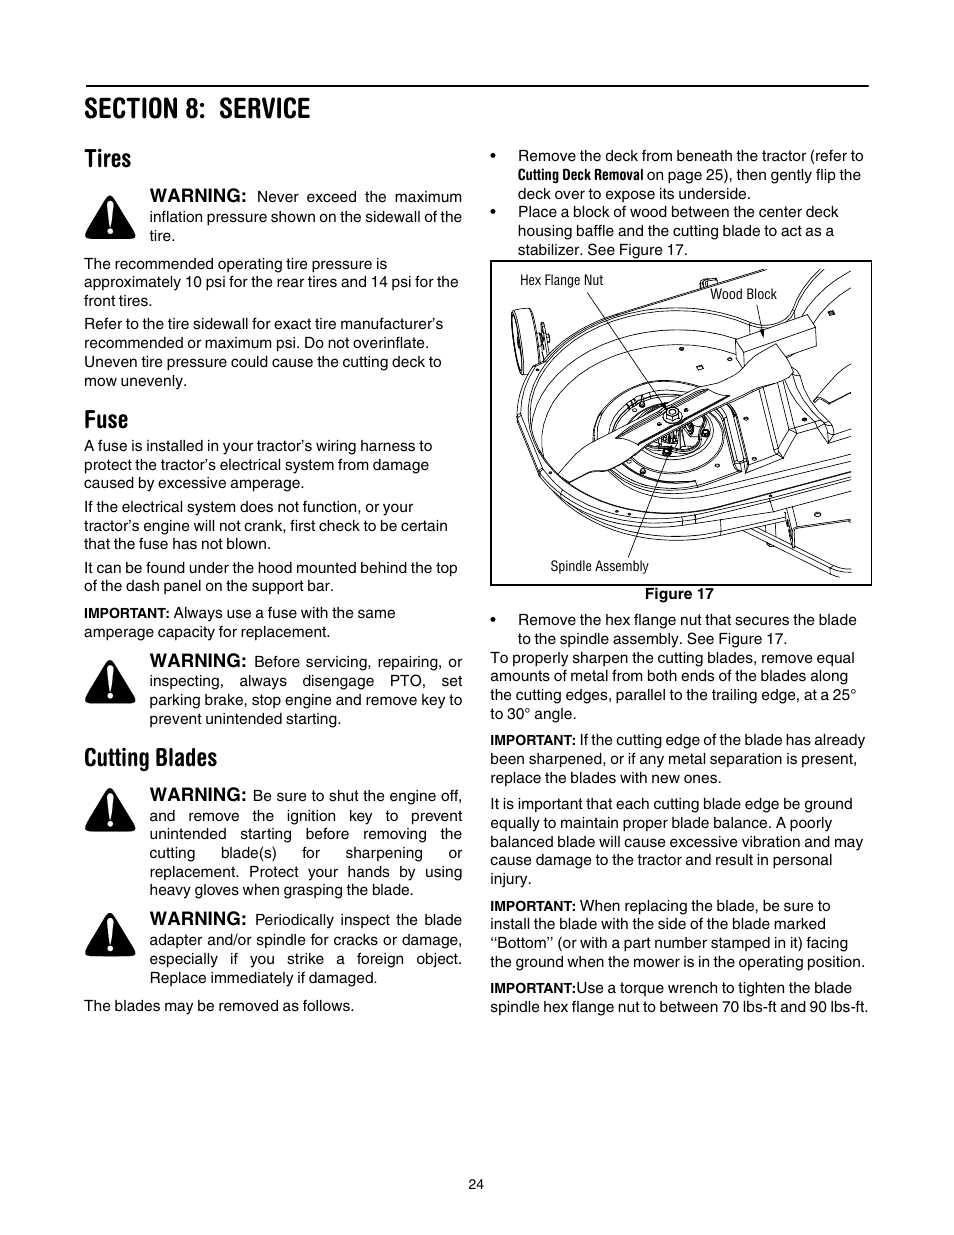 Tires, Fuse, Cutting blades   Cub Cadet LT1040 User Manual   Page 24 / 36